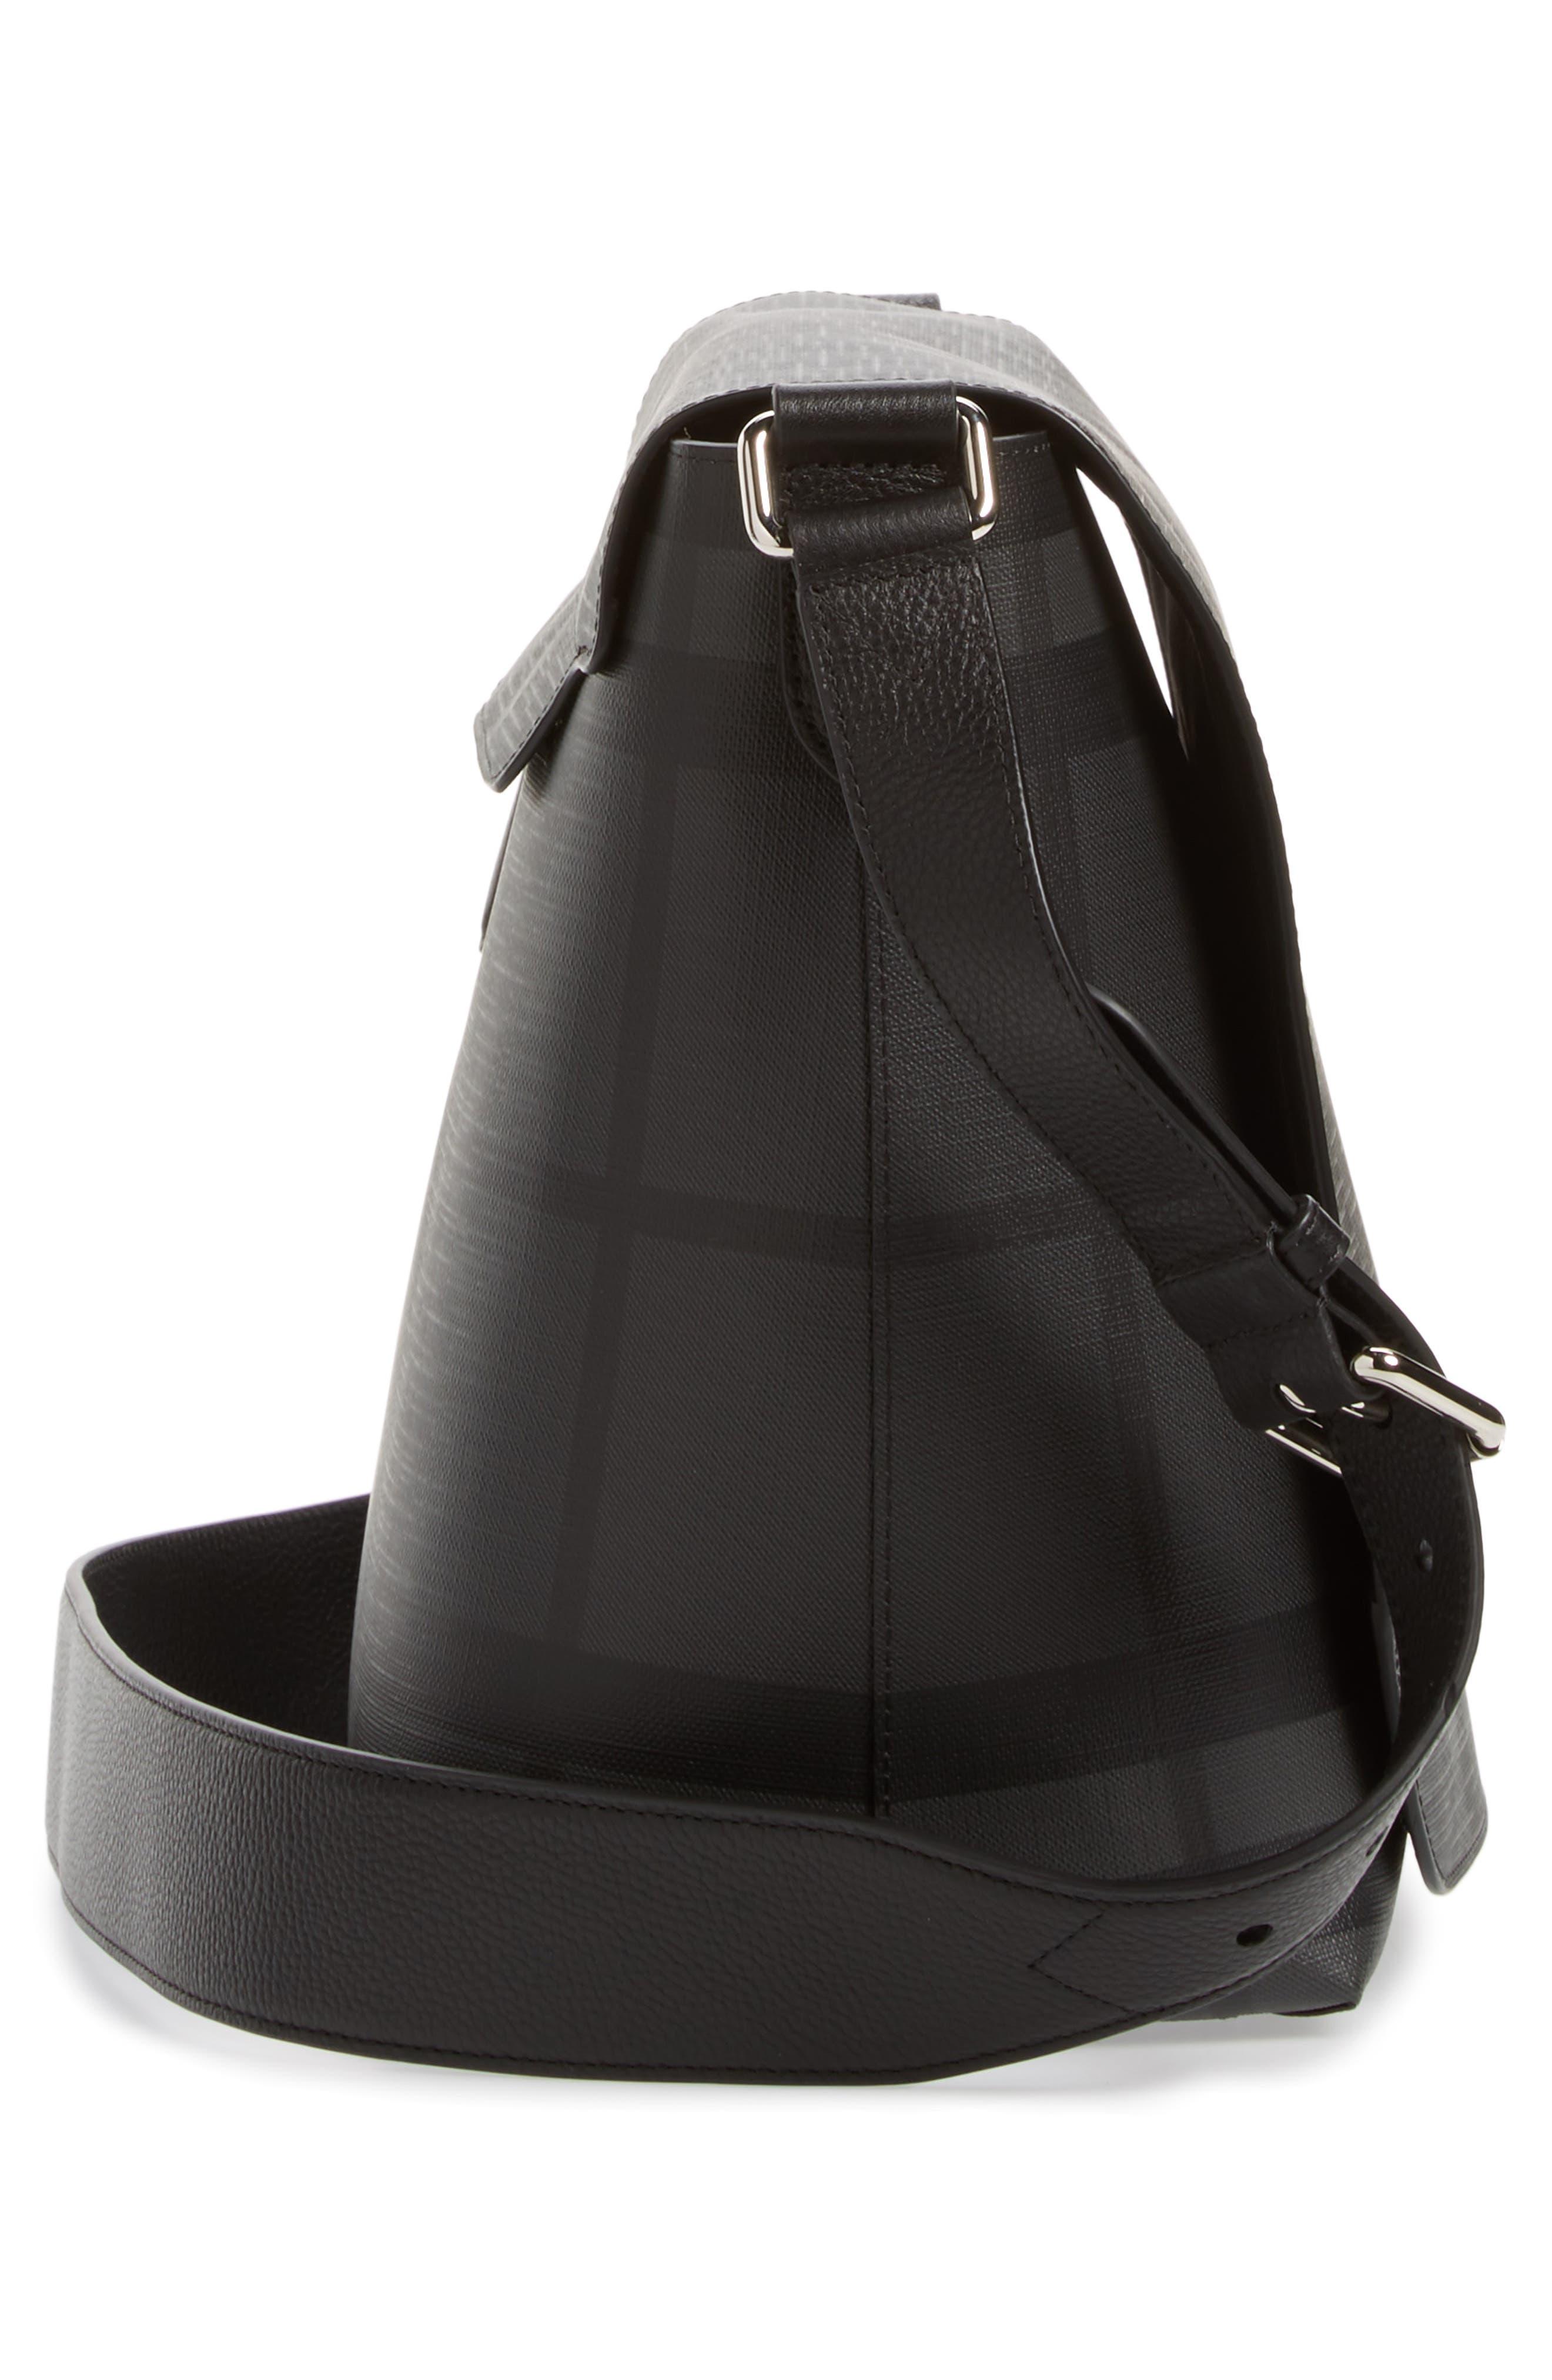 London Check Messenger Bag,                             Alternate thumbnail 5, color,                             Charcoal/ Black